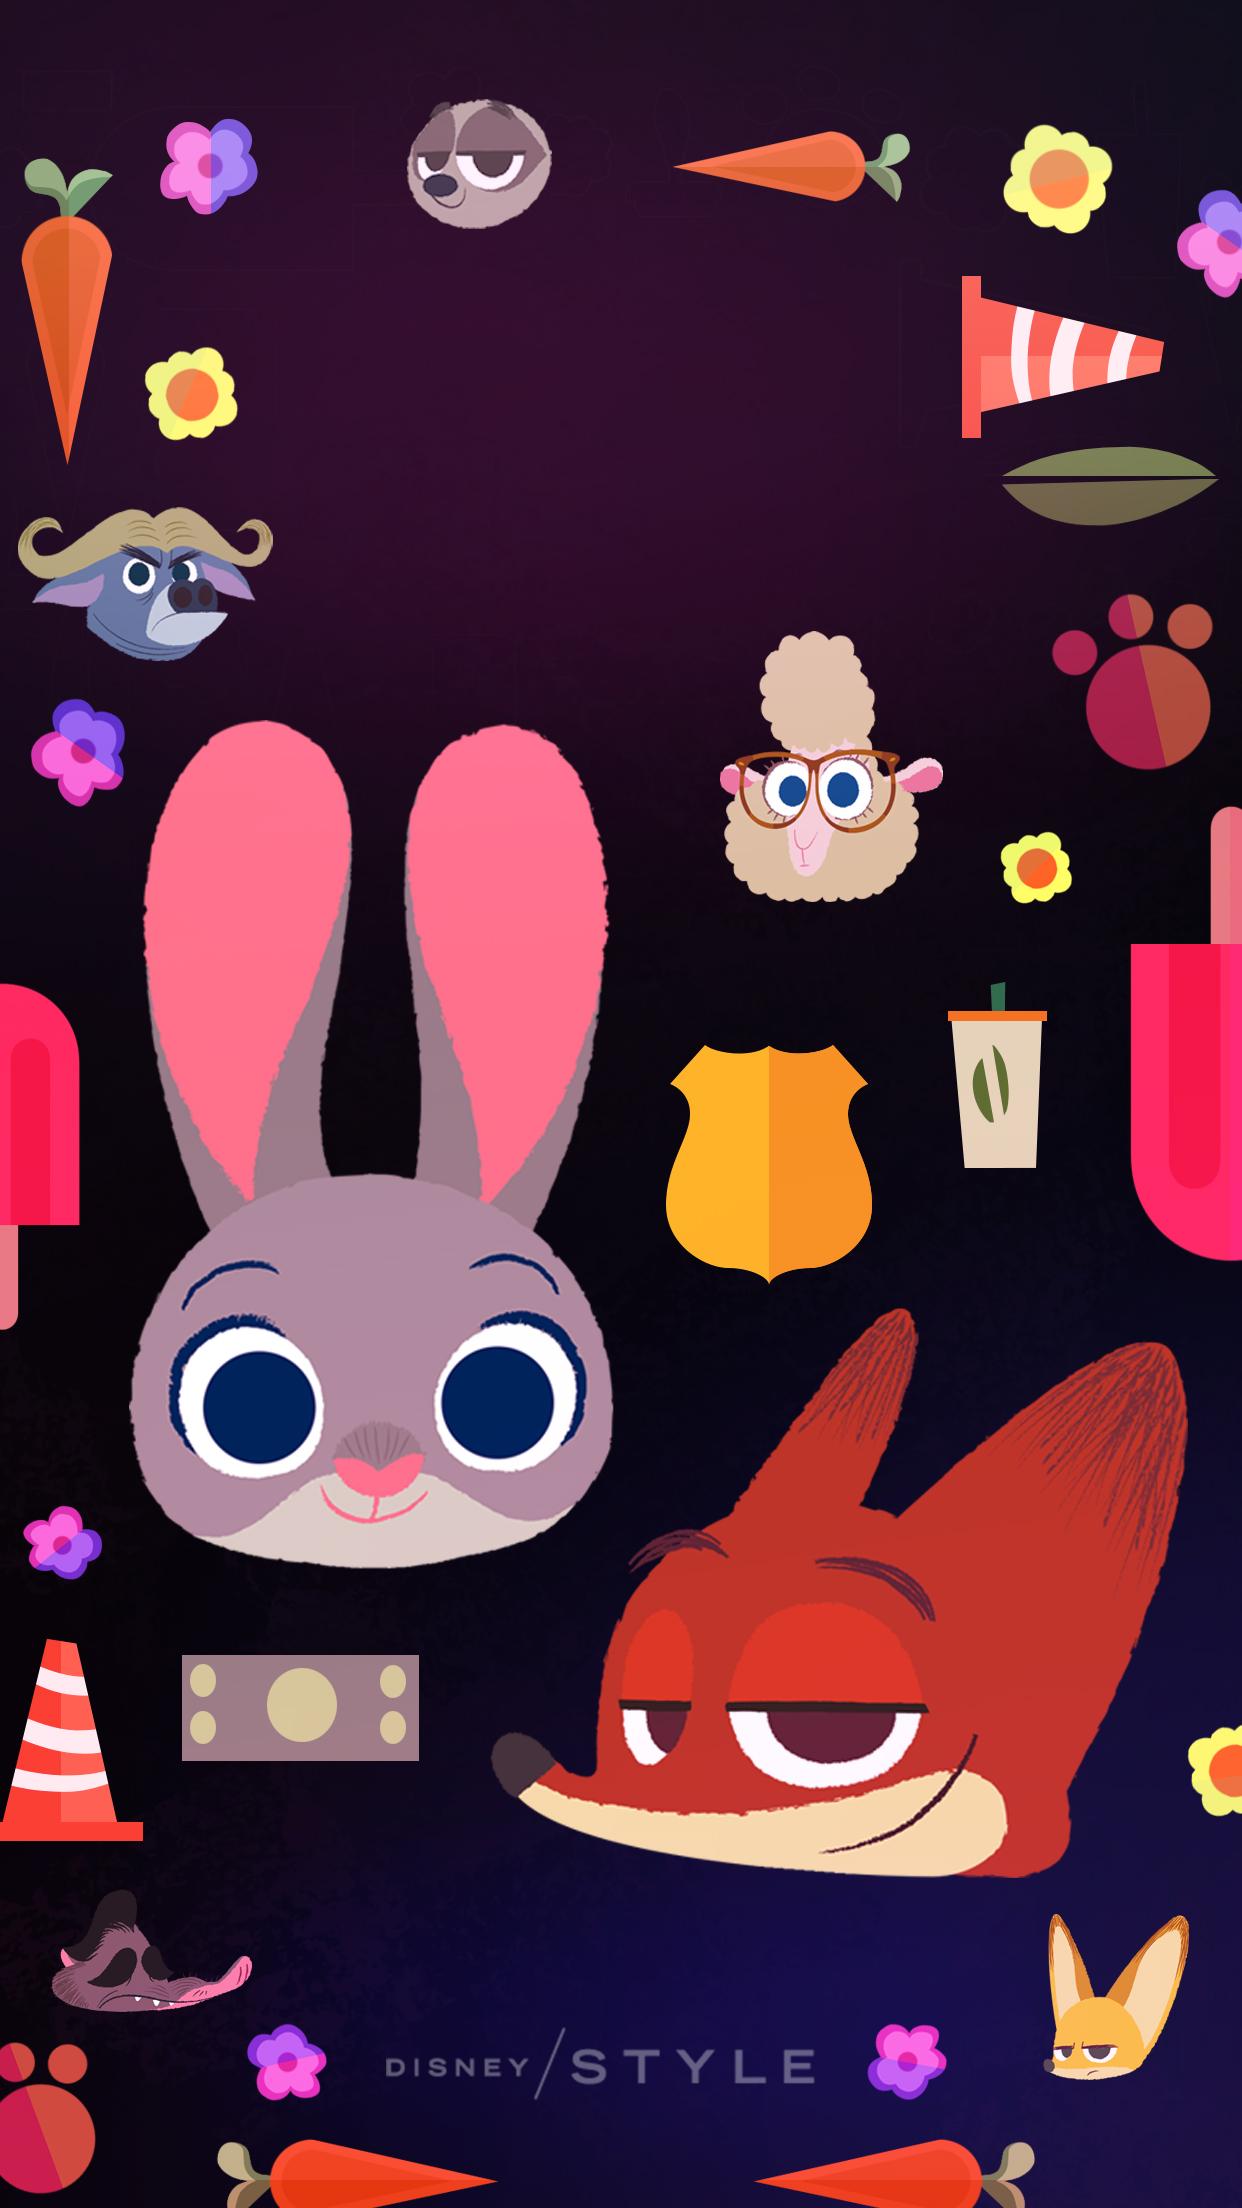 Cute Cartoon Wallpapers For Mobile Phones Free Disney Phone Backgrounds Pixelstalk Net